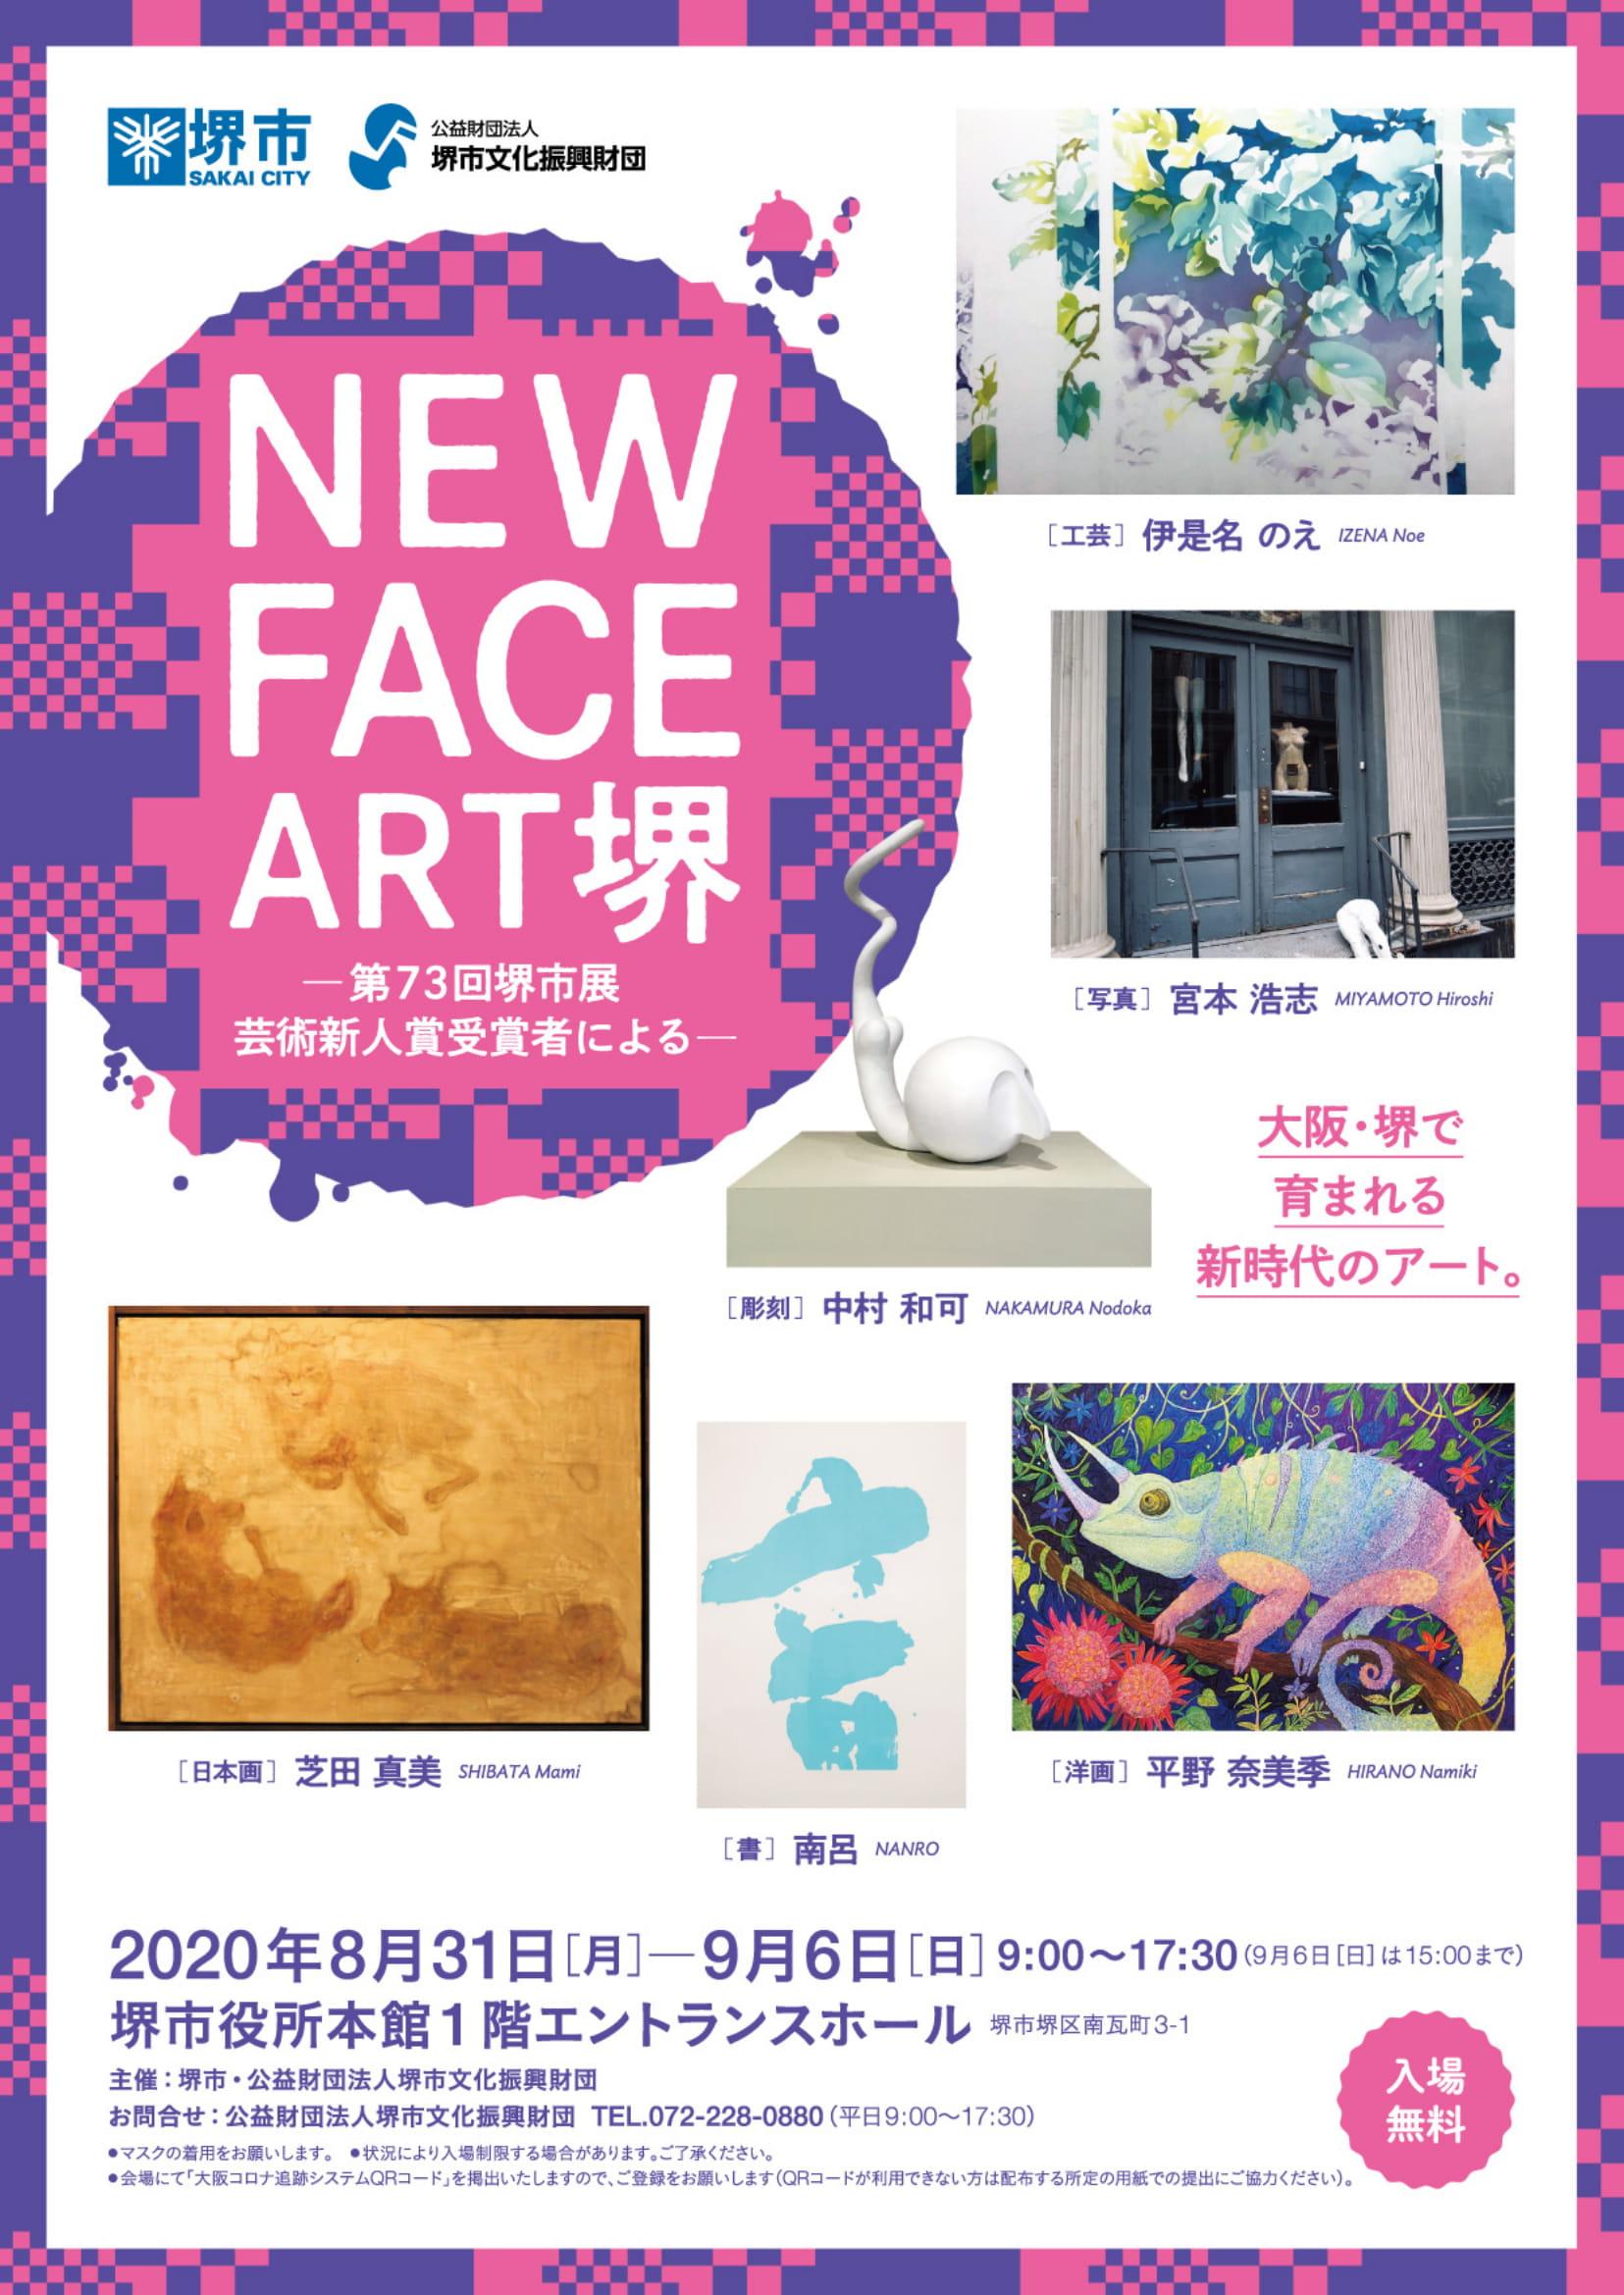 NEW FACE ART 堺 ー第73回堺市展芸術新人賞受賞者によるー